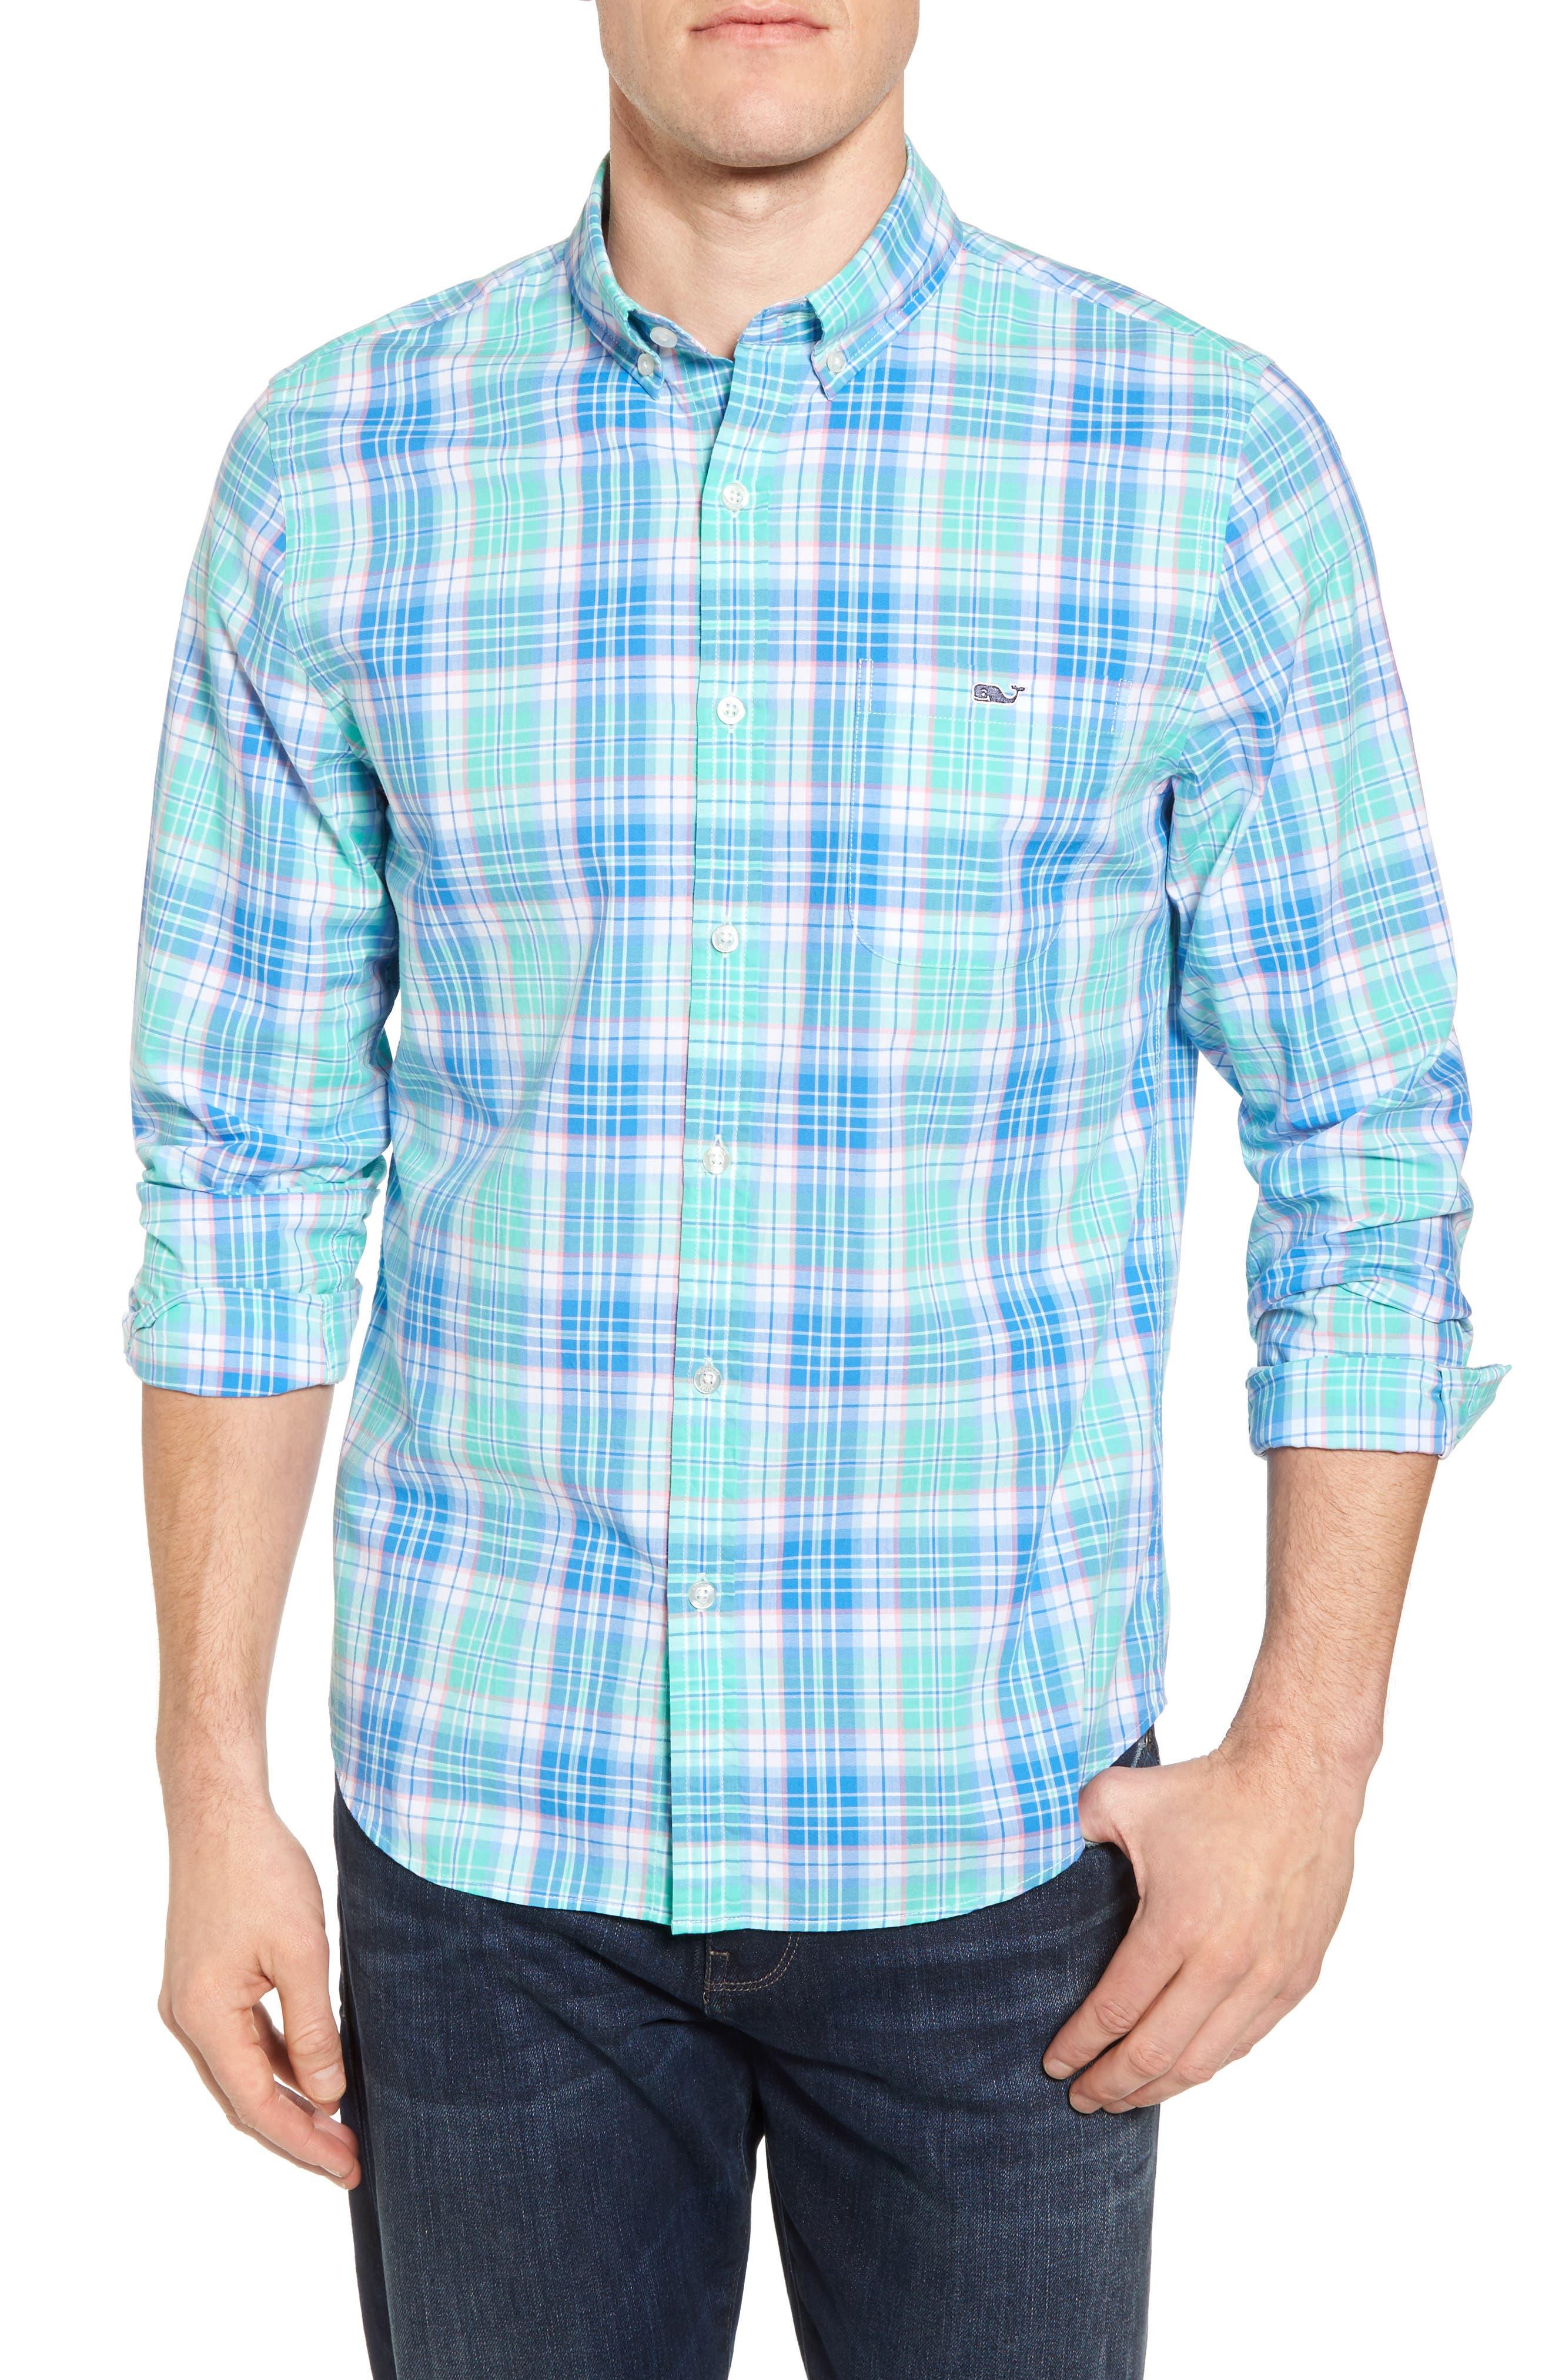 Sutherland Road Slim Fit Plaid Sport Shirt,                         Main,                         color, Antigua Green